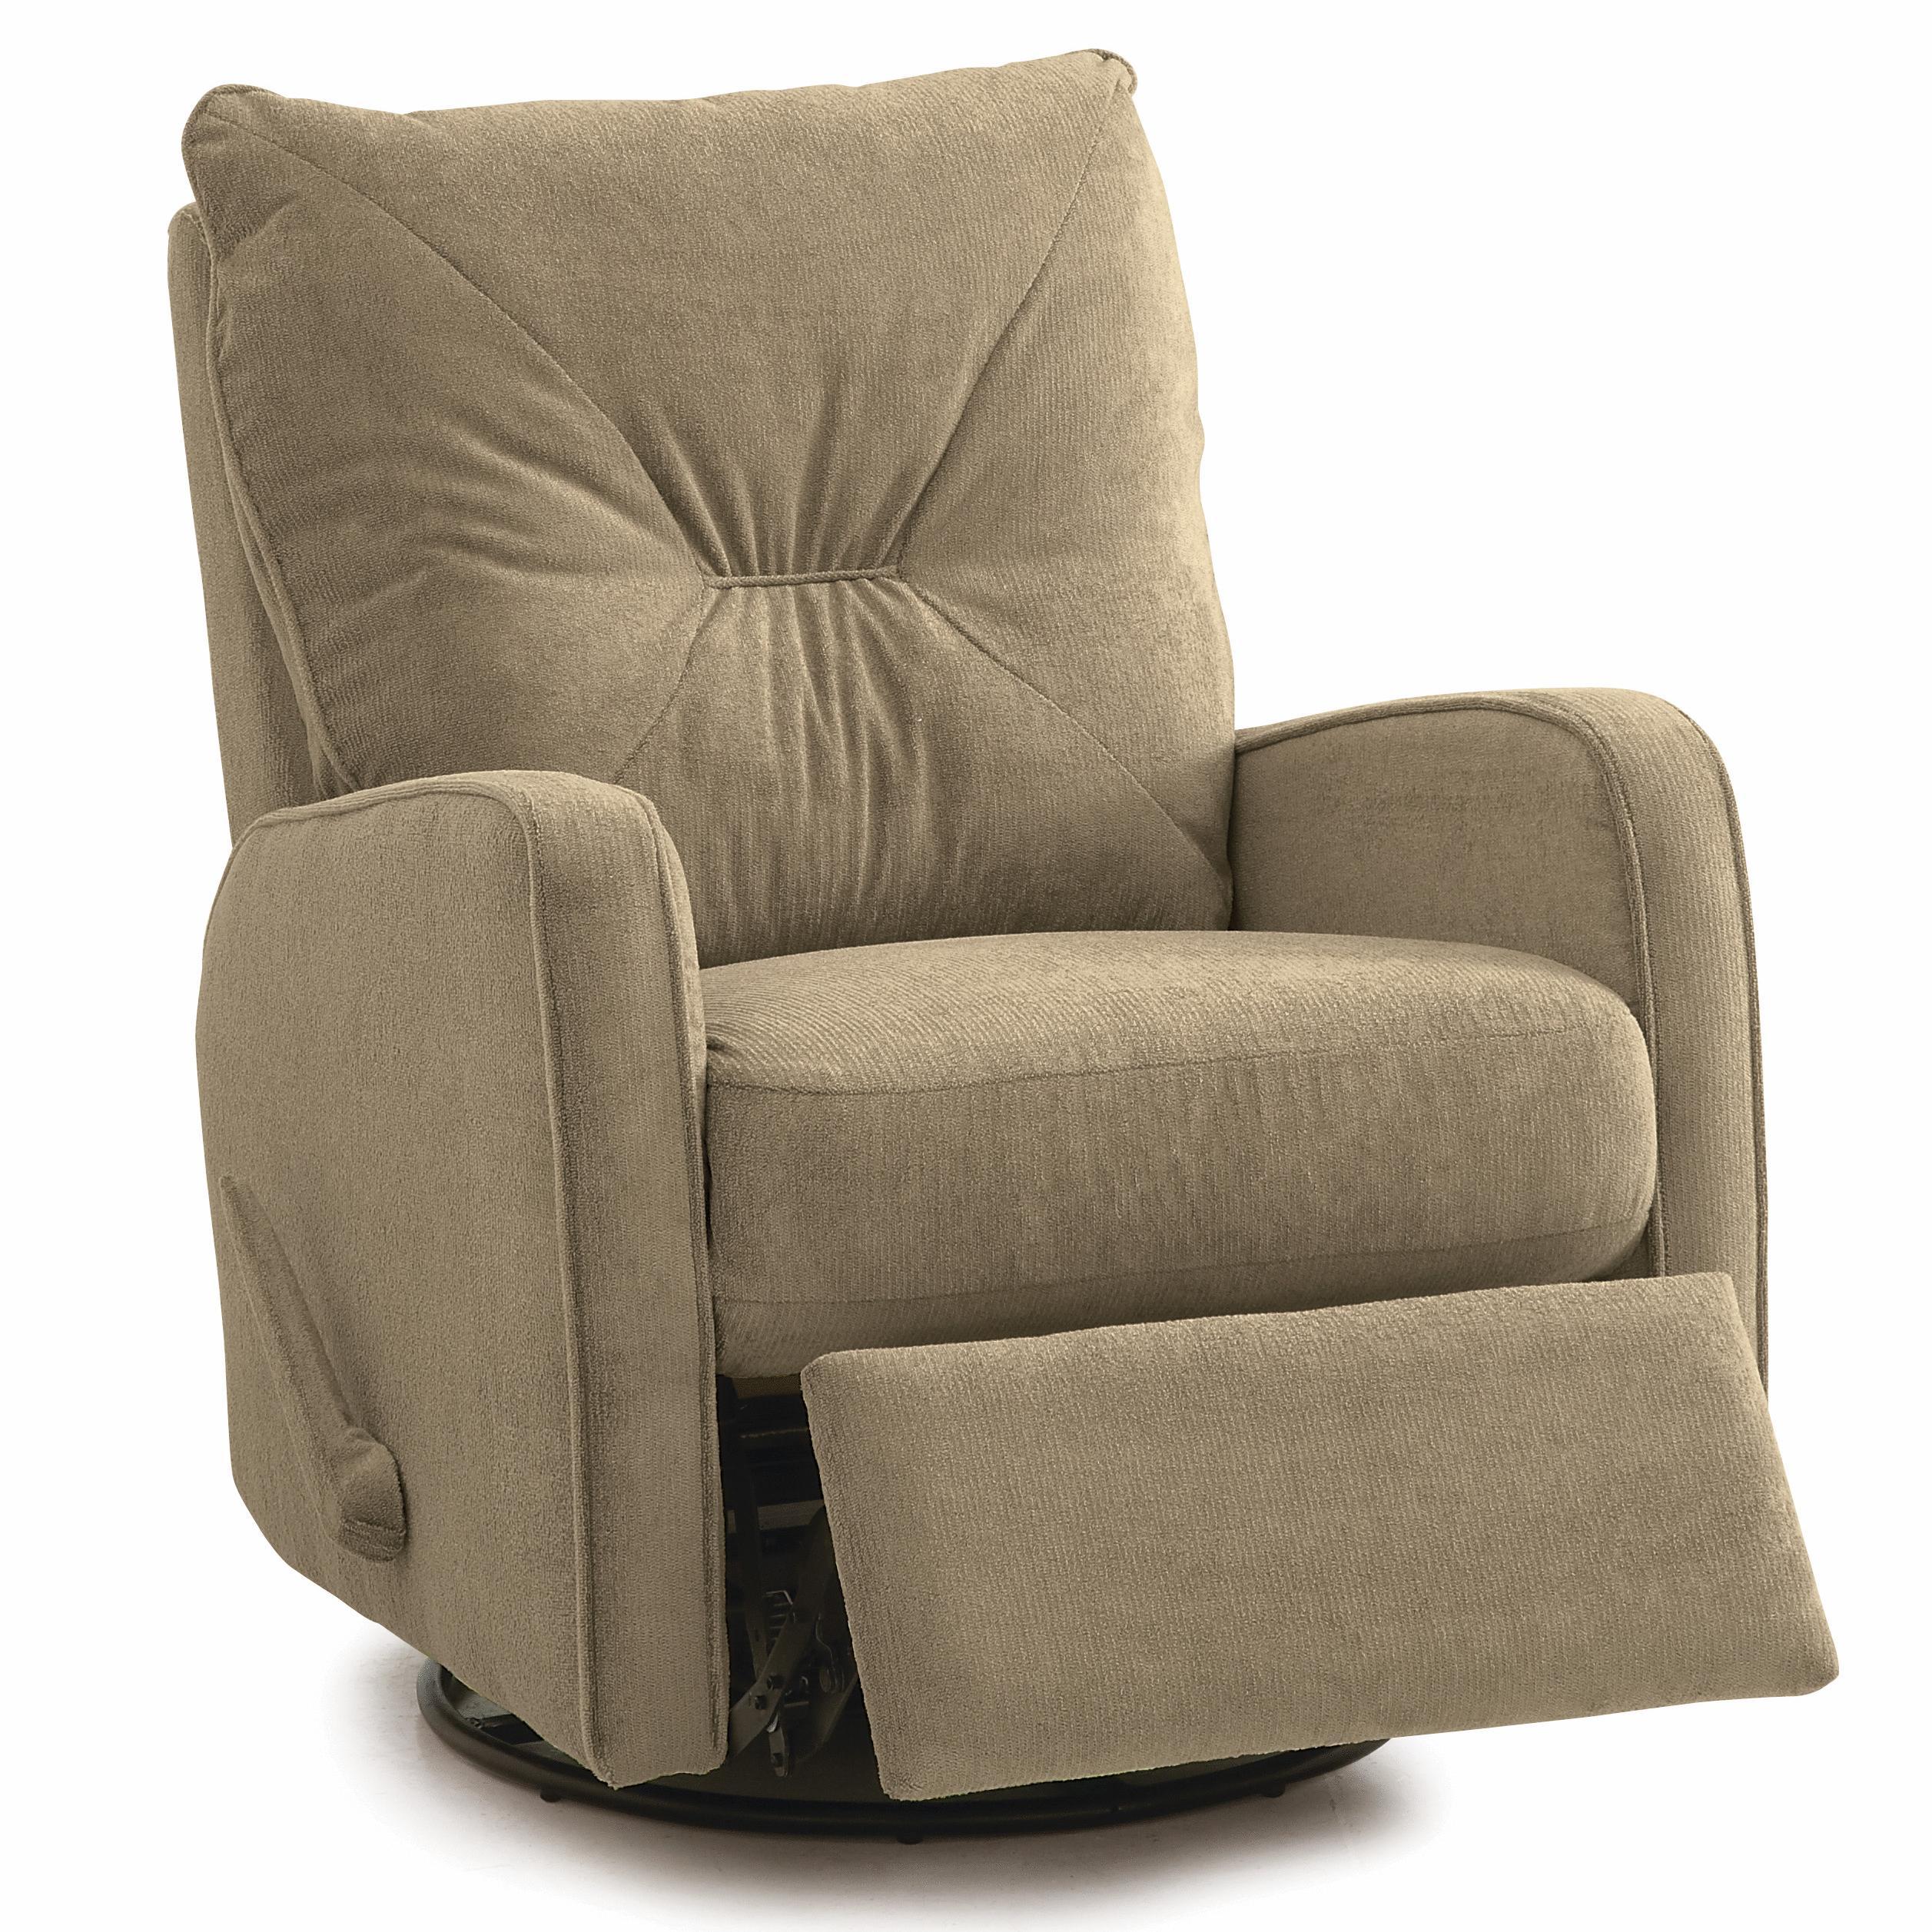 Palliser Theo Contemporary Swivel Rocking Reclining Chair